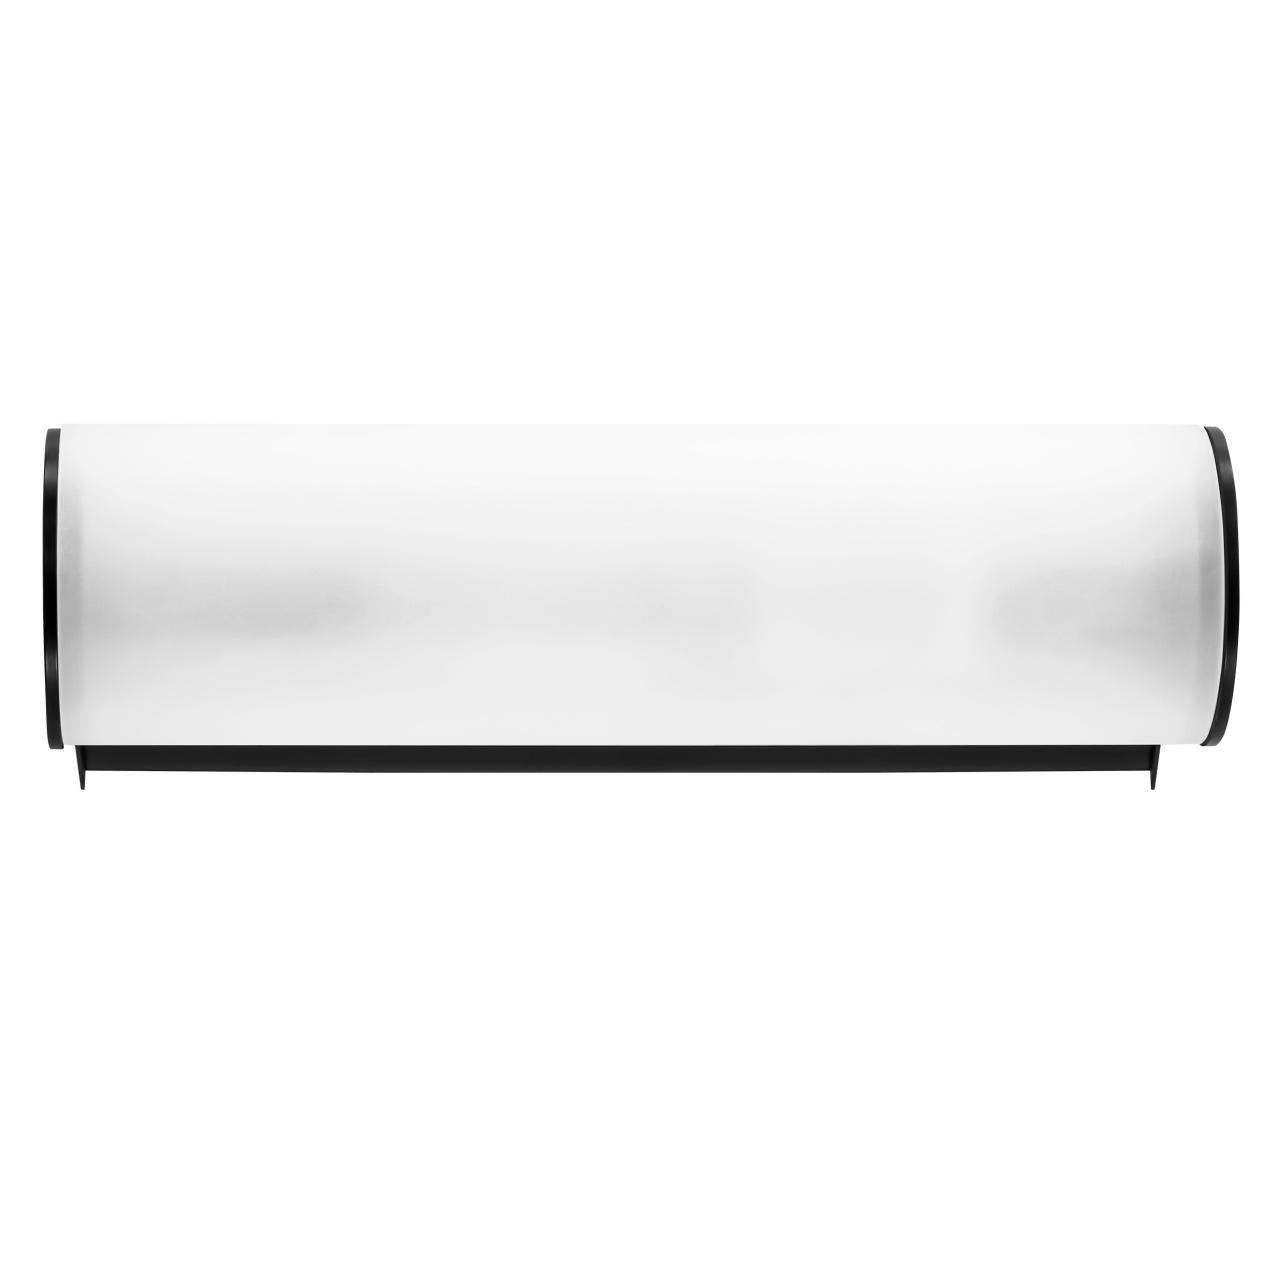 Светильник настенный Blanda 1х40W E14 черный / белый Lightstar 801817